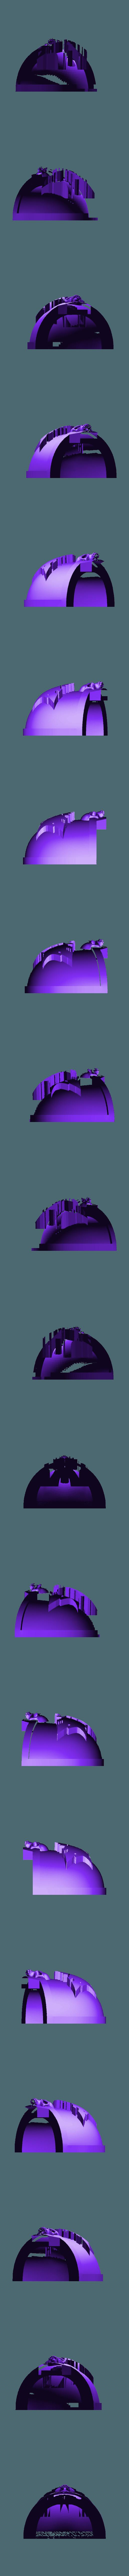 Morkai_Rep_MKVII_3_Pad.stl Download free STL file Double Wolf head Chapter insignia • 3D printing model, Tatsura